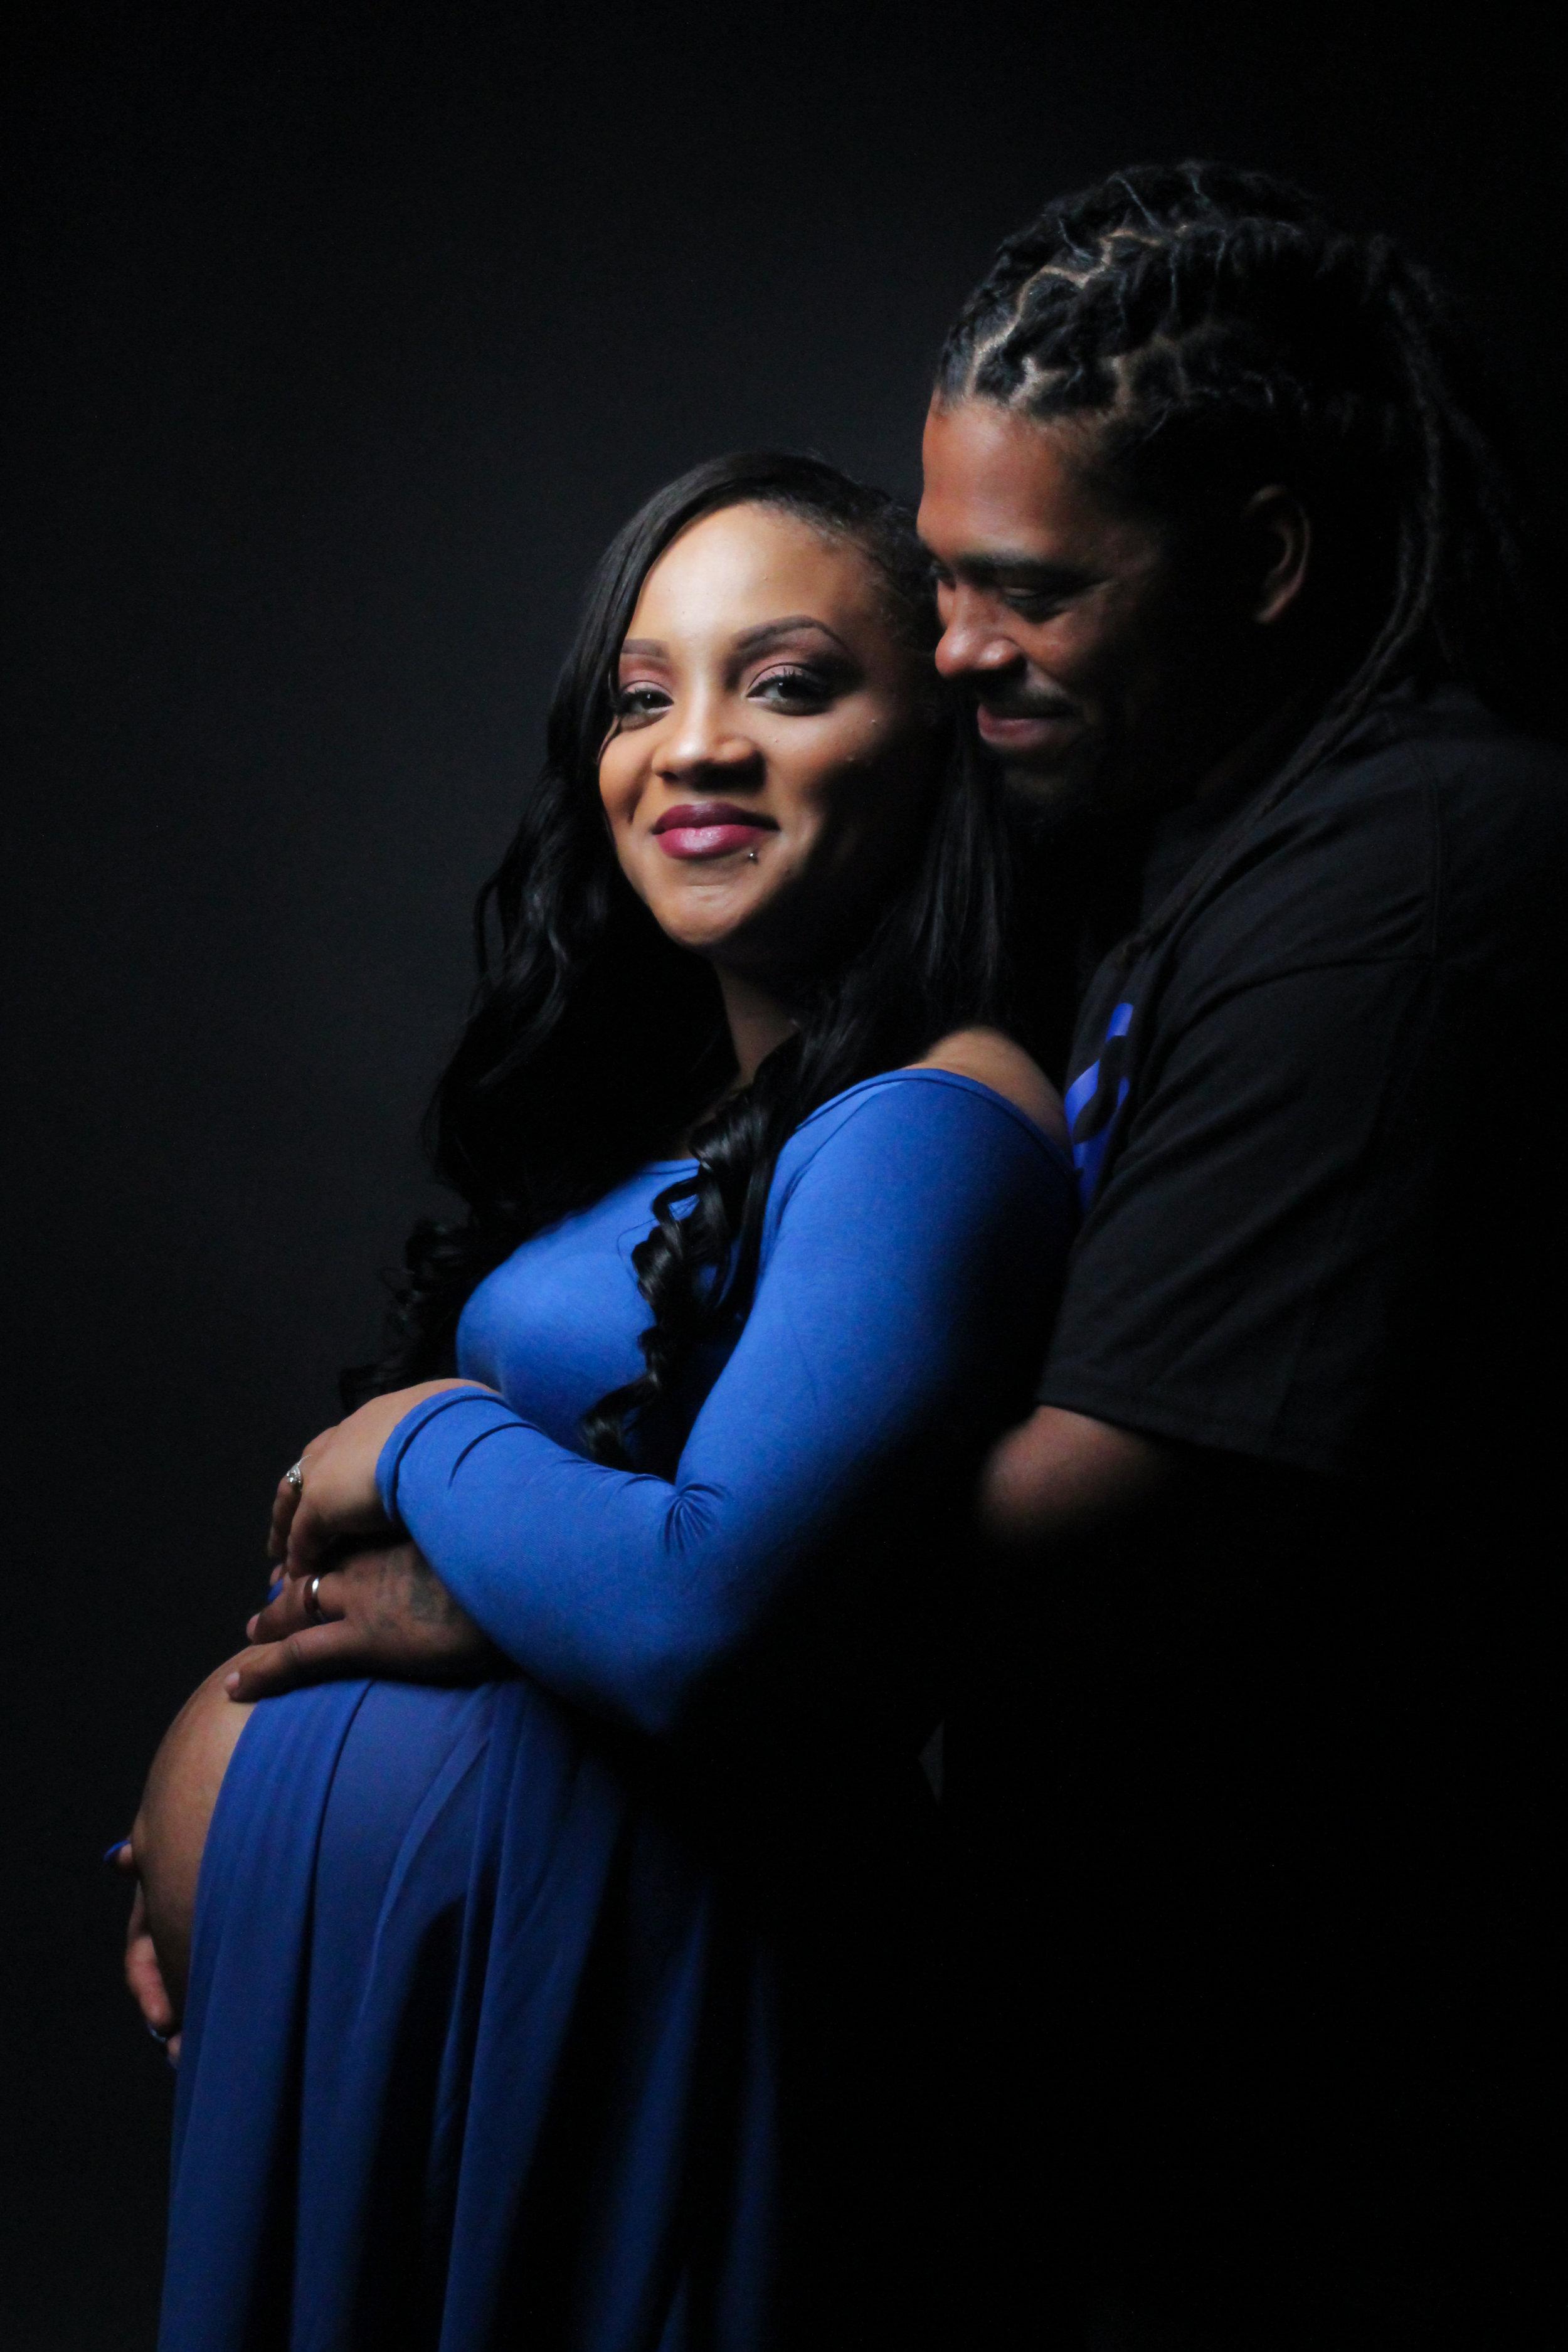 MaternityPhotographyWichitaKs-5.jpg